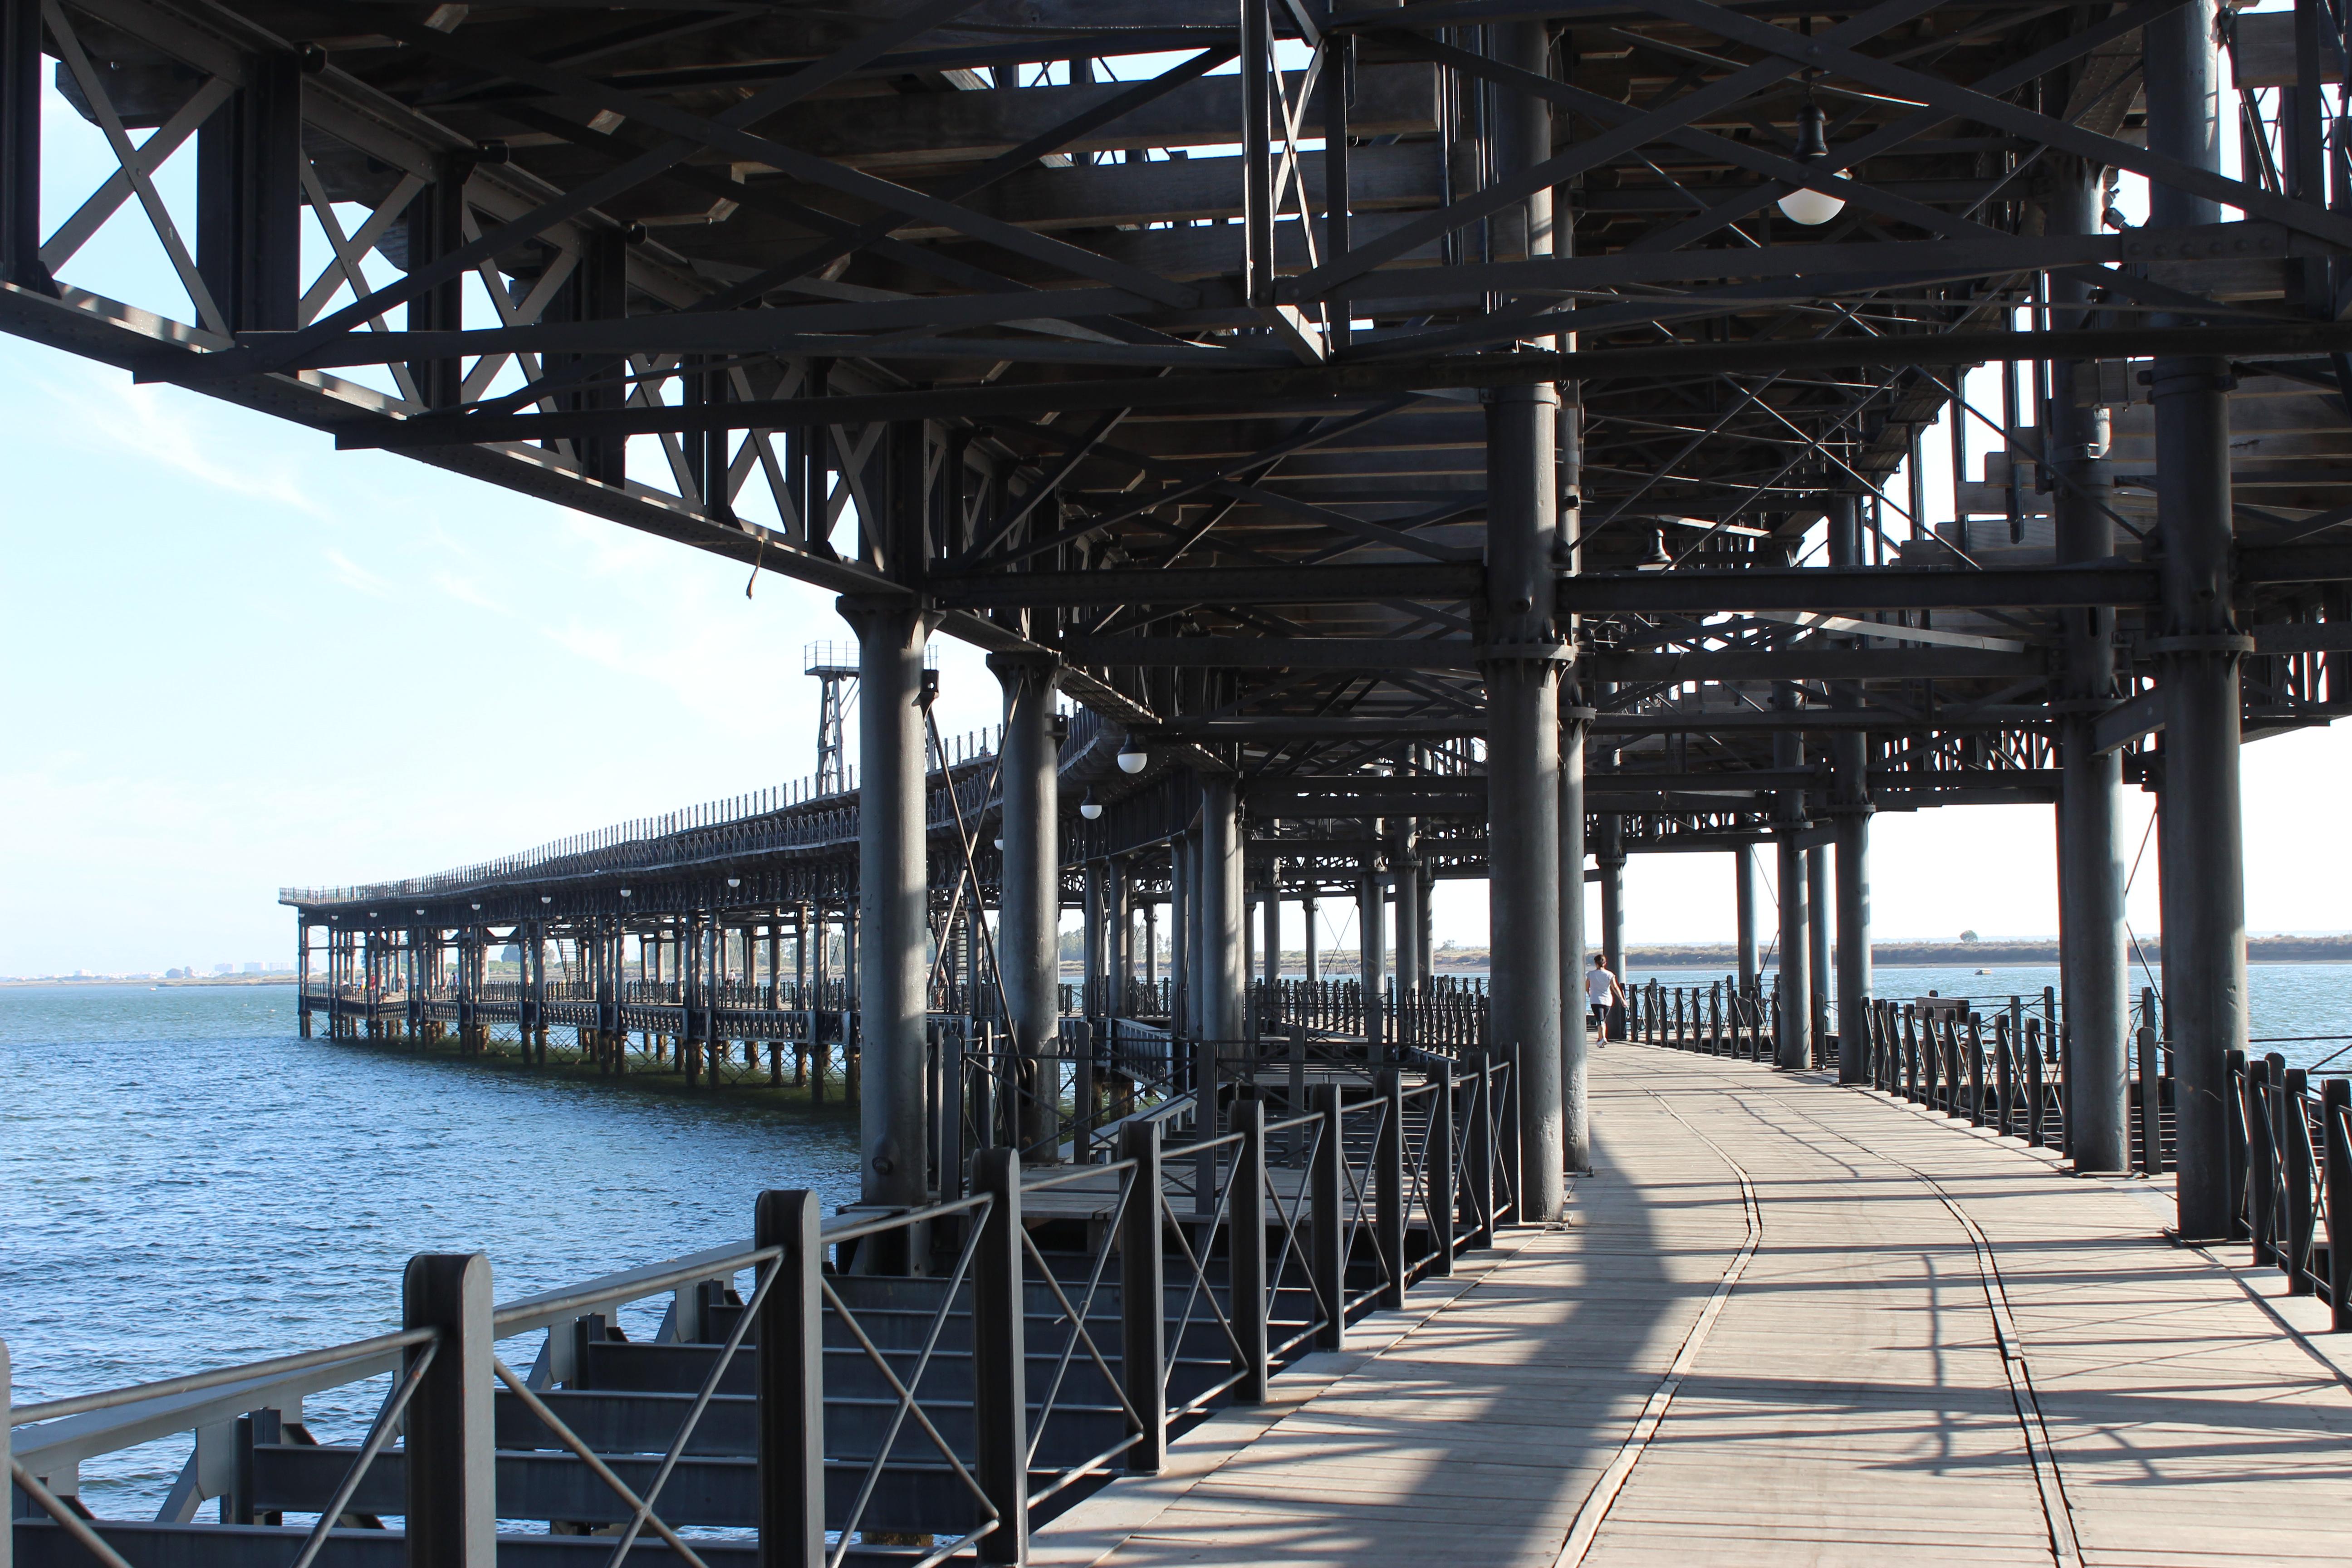 Muelle del Tinto - M. Bautista